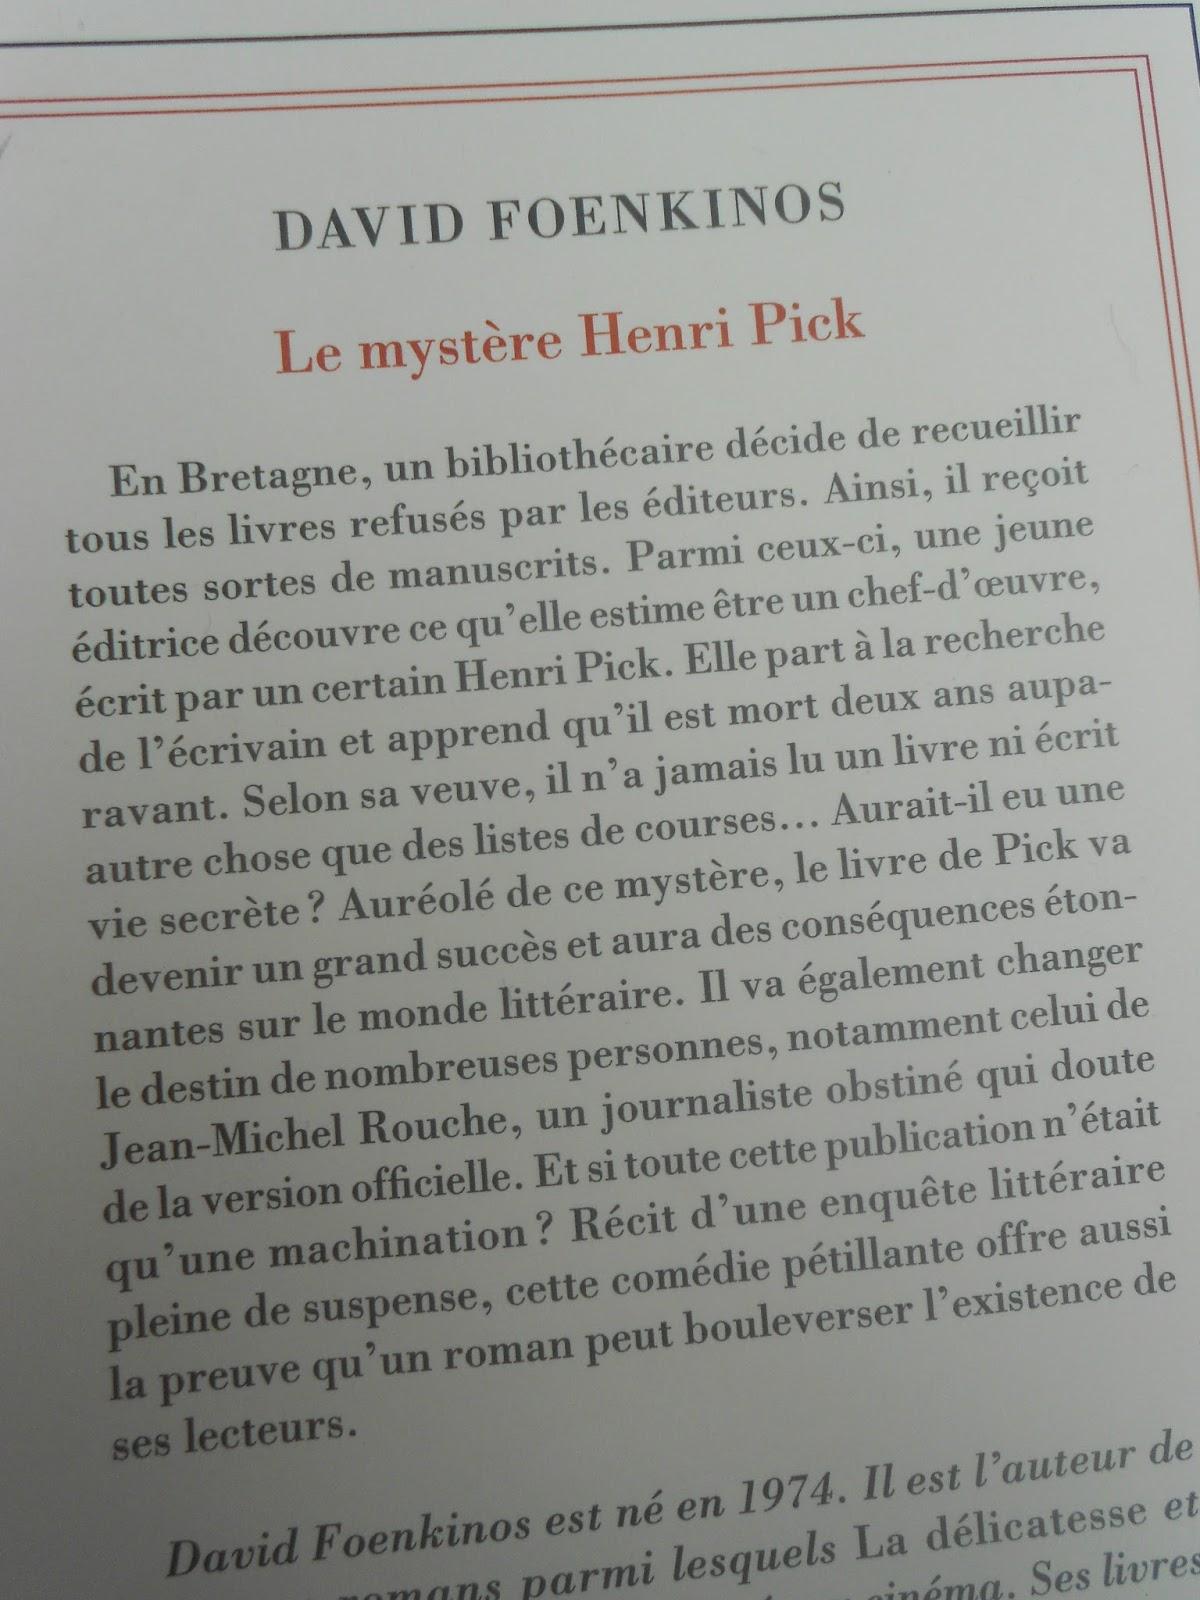 Le Mystere Henri Pick Histoire Vraie : mystere, henri, histoire, vraie, Mystère, Henri, Pick